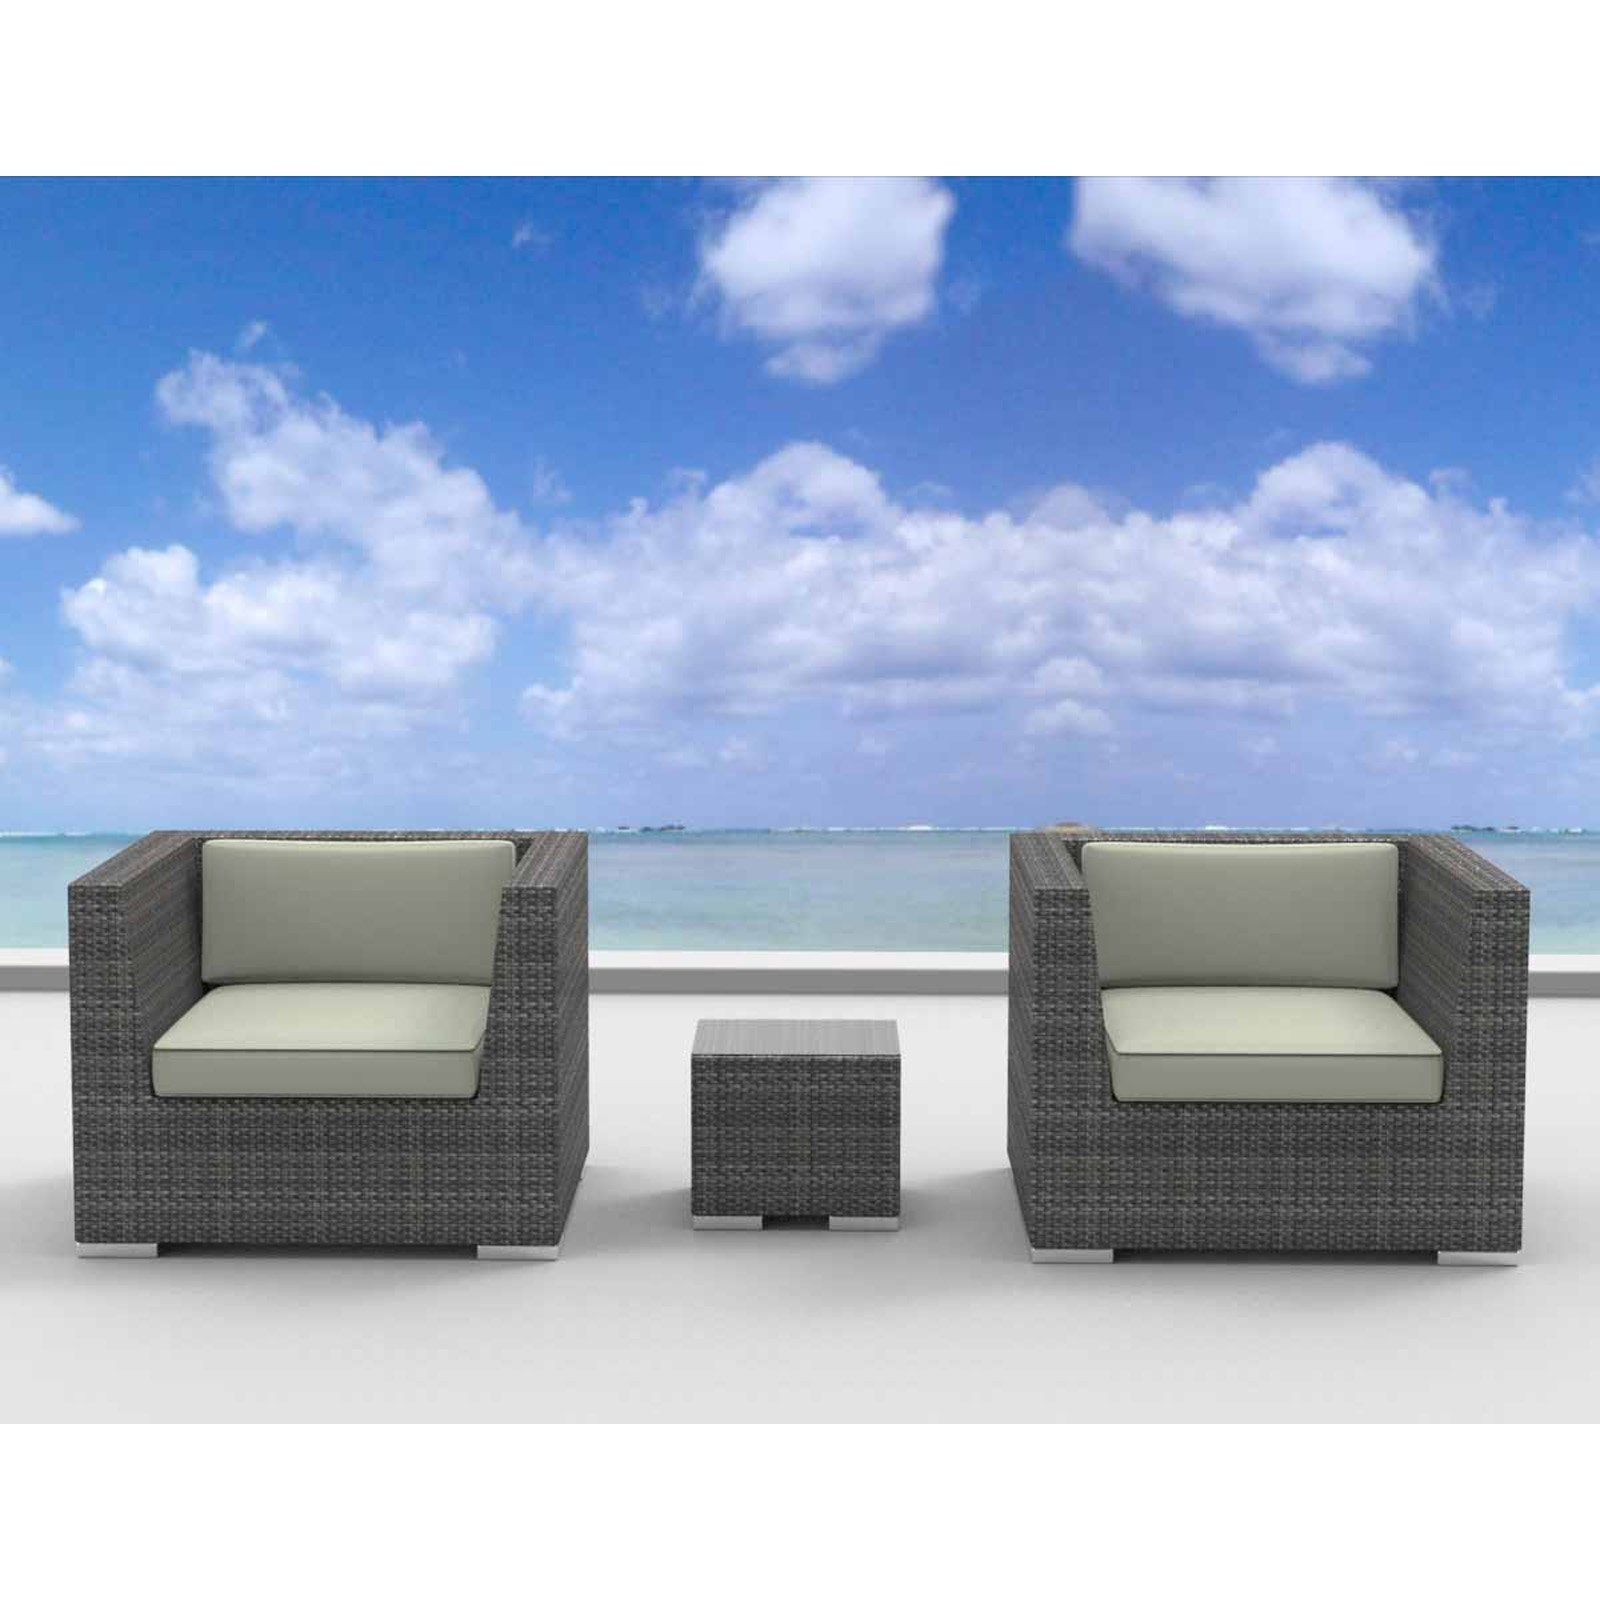 Urban Furnishing St Croix 3 Piece Outdoor Wicker Patio Furniture